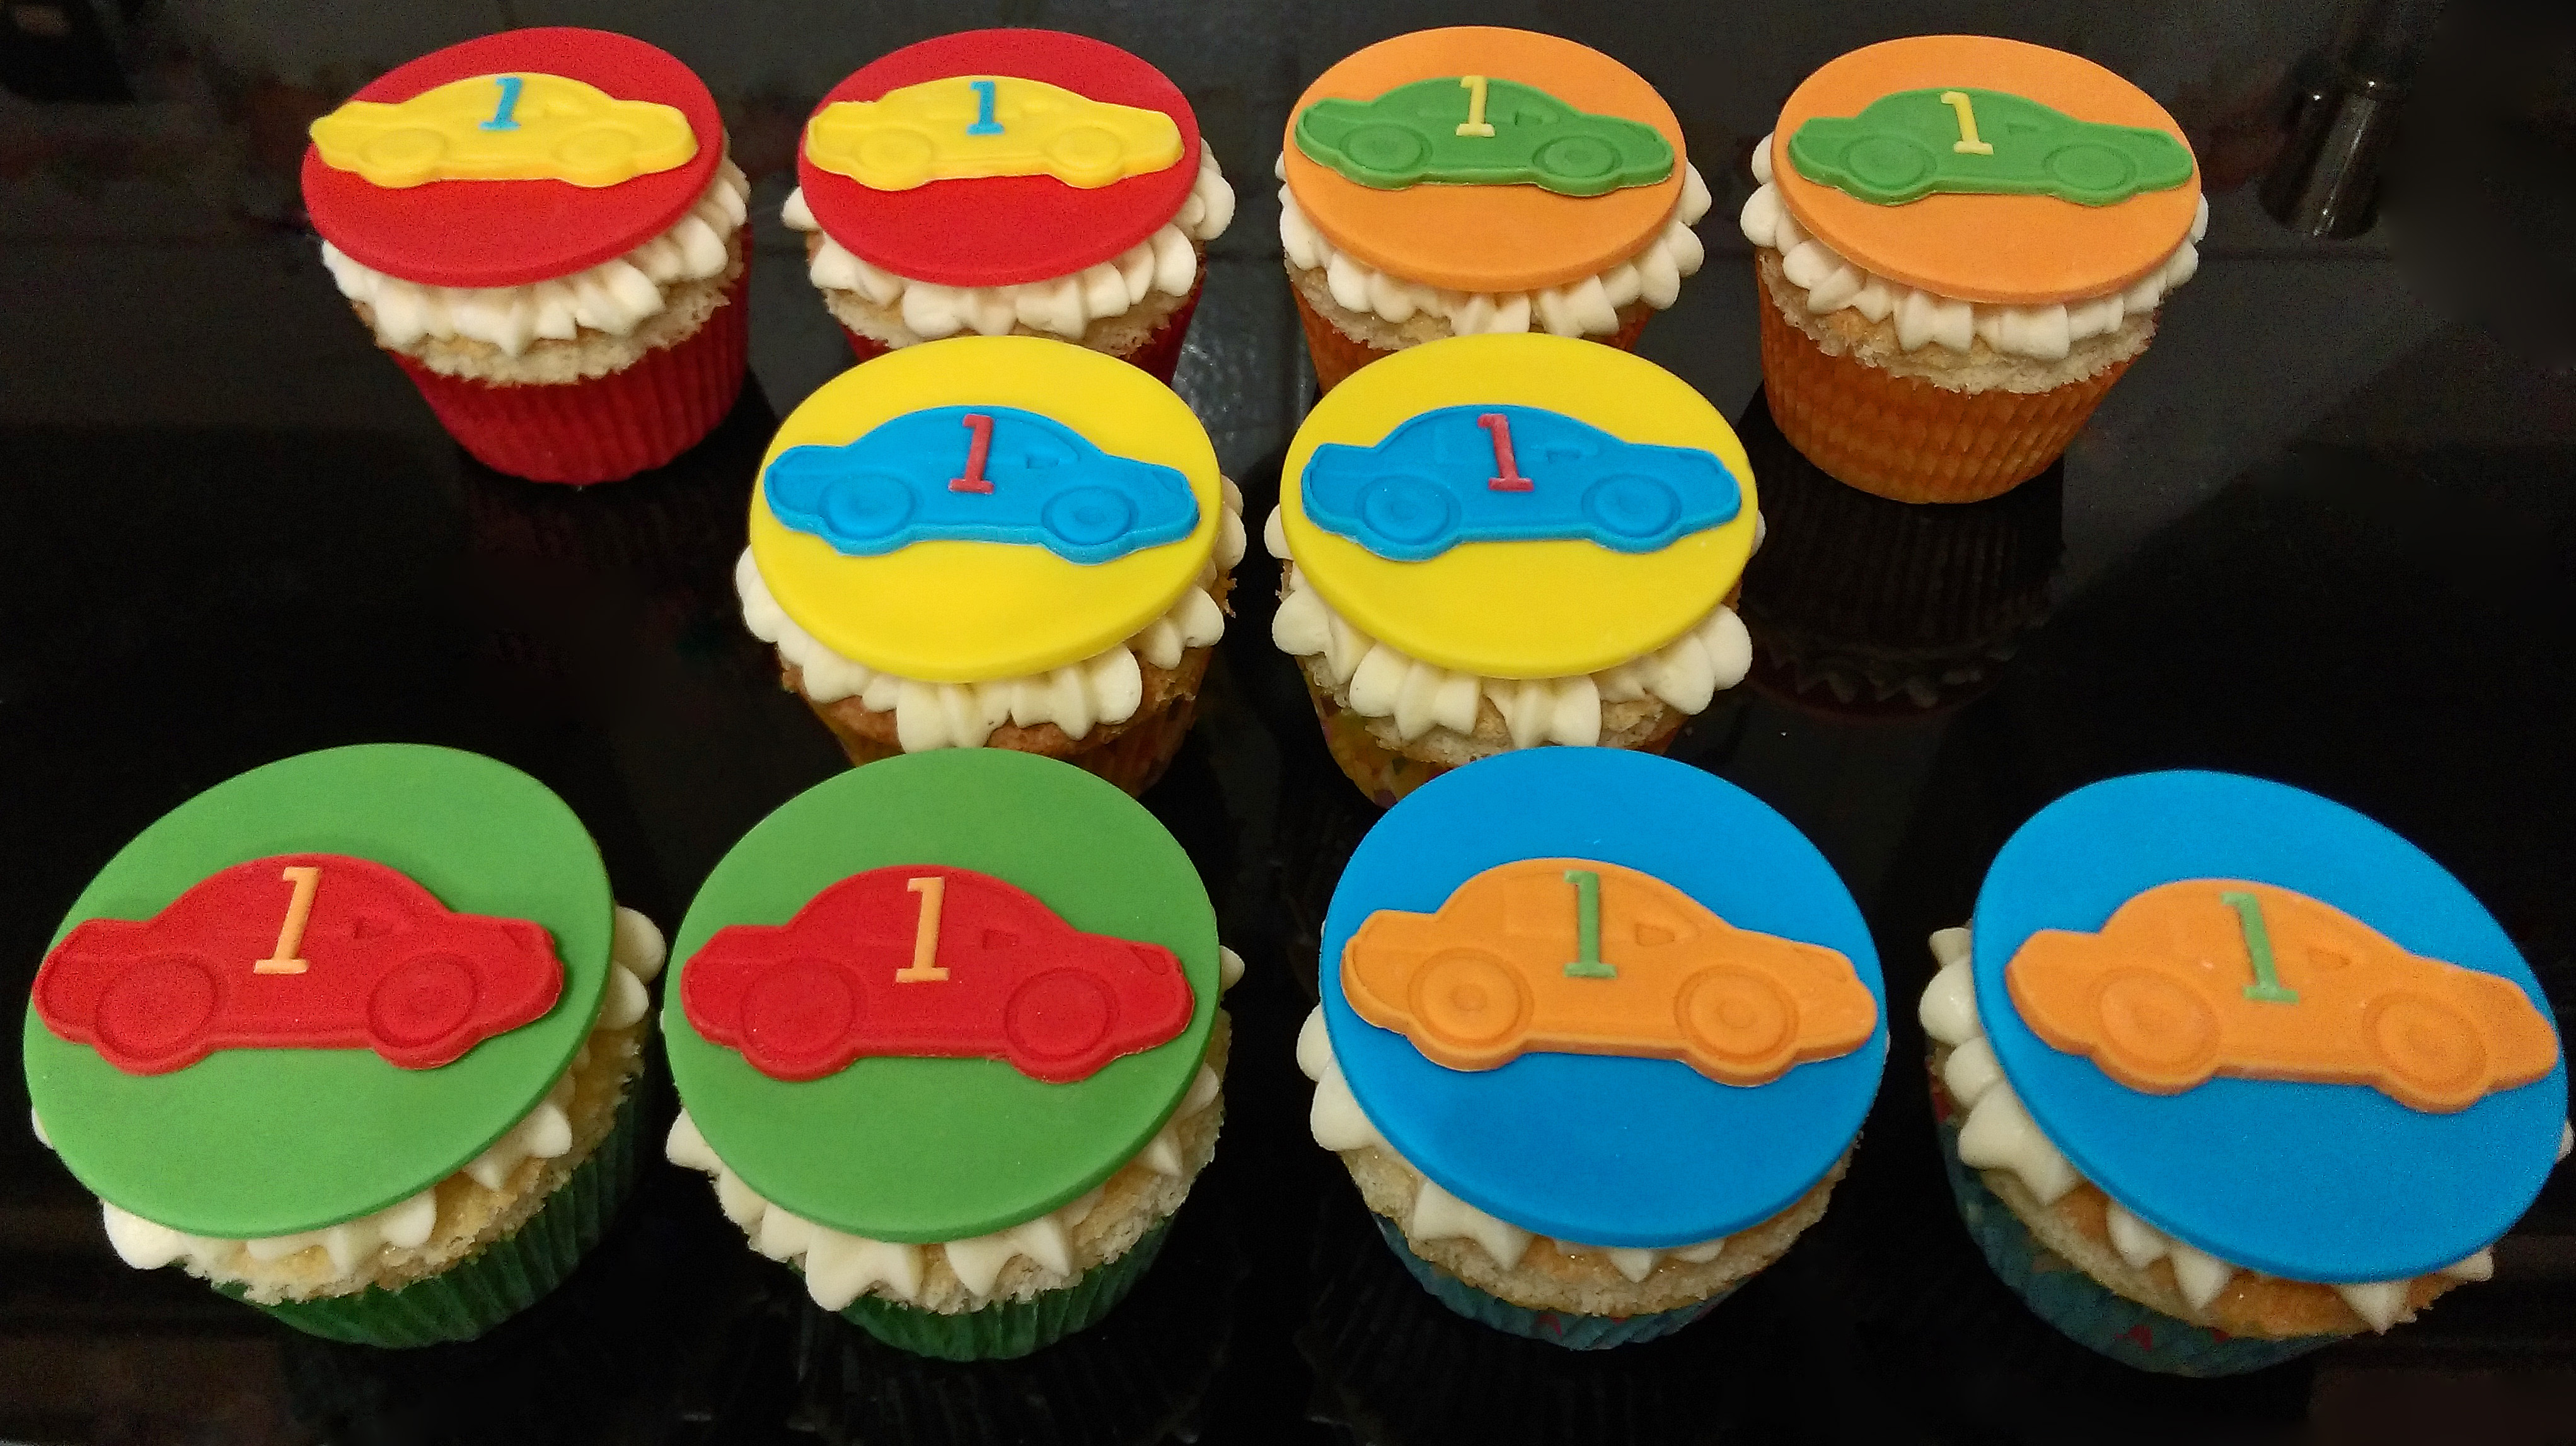 Coloured Car Cupcakes